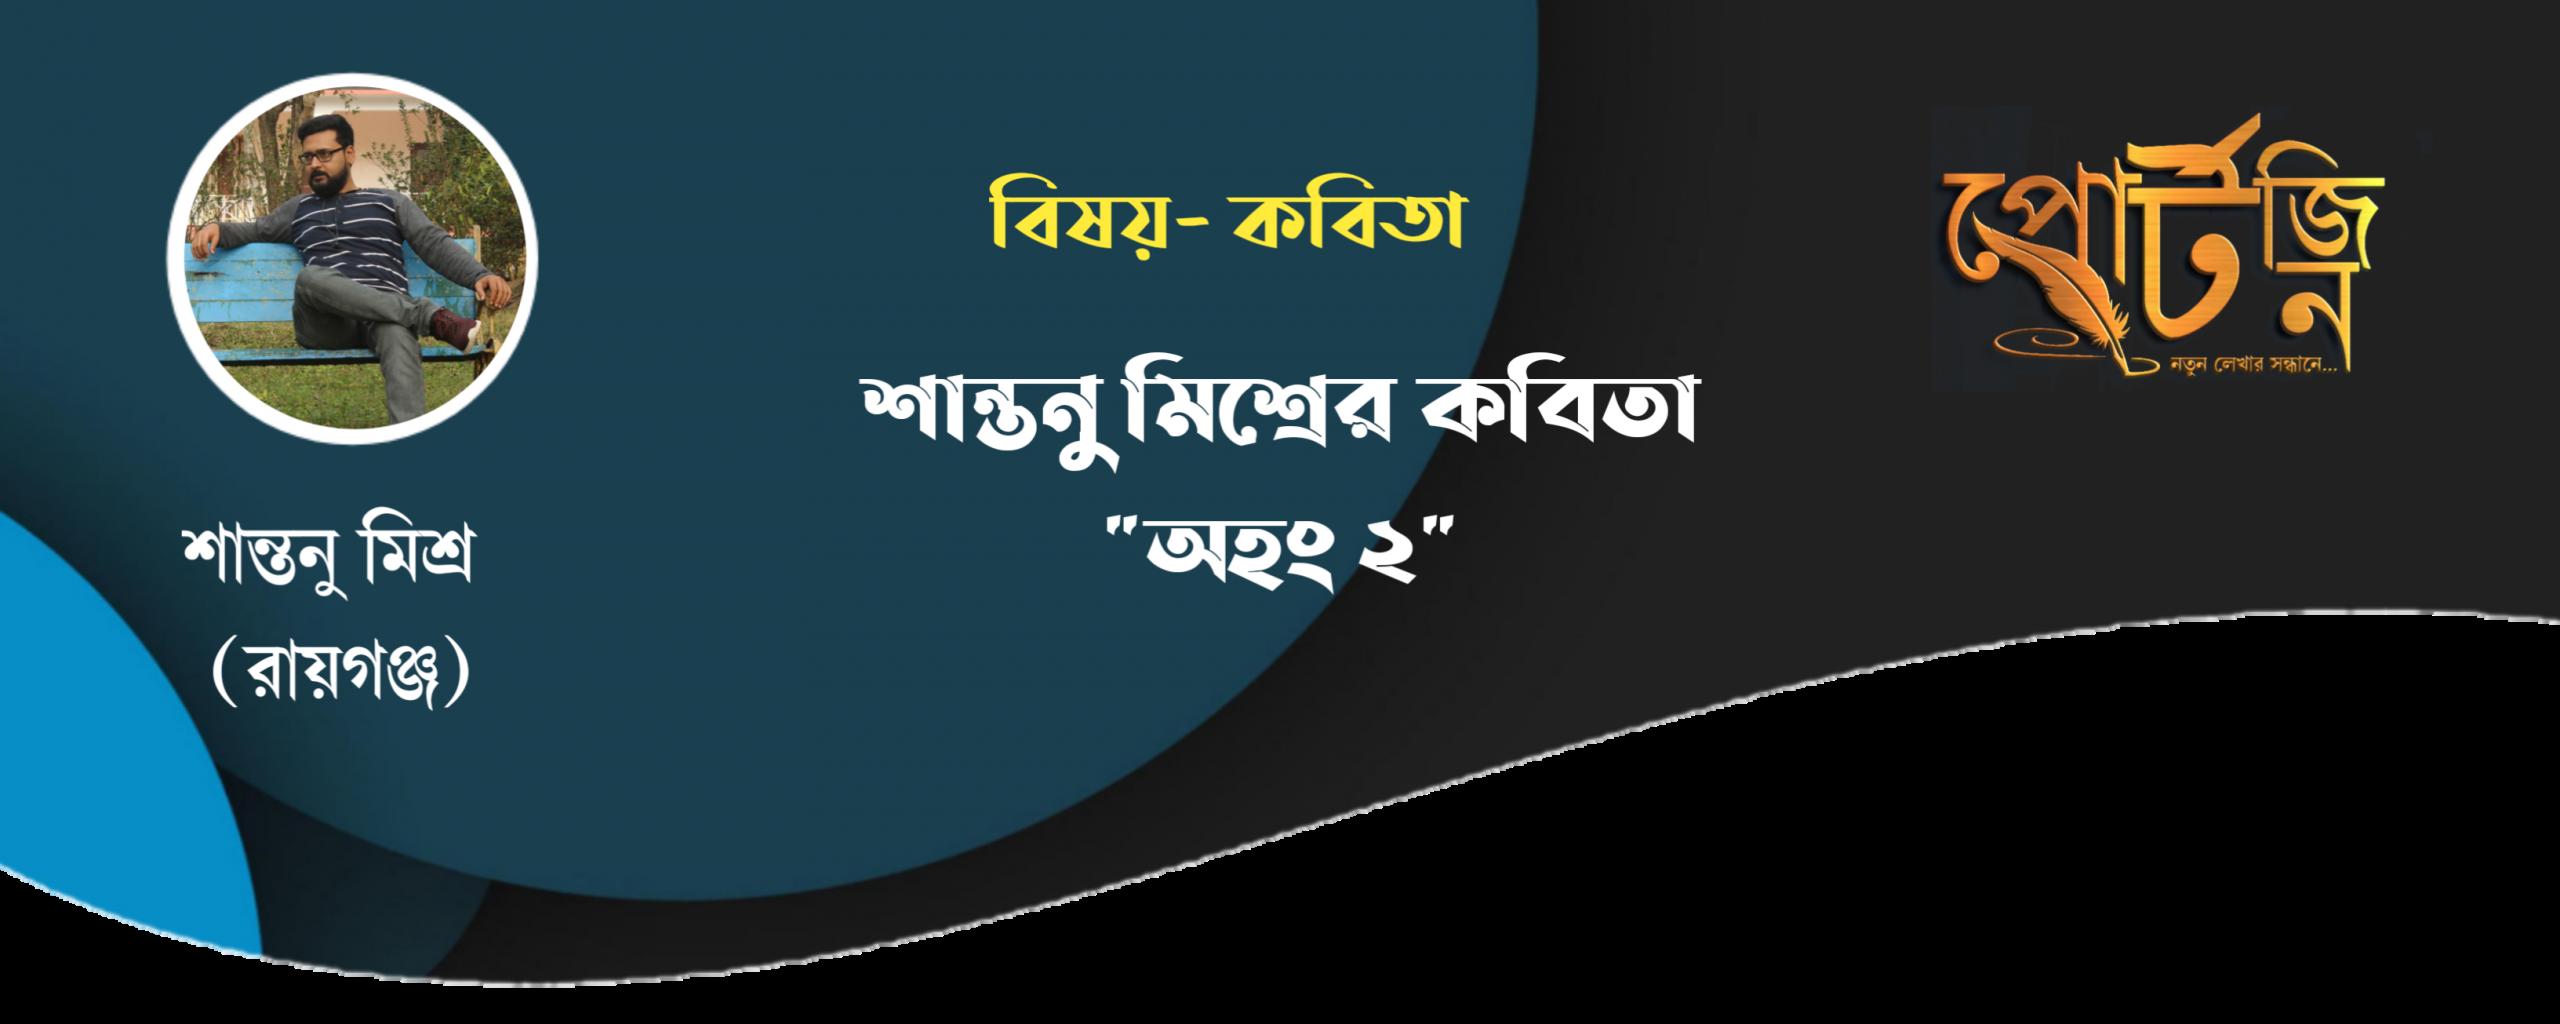 bengali poem santanu mishra portzine bengal live